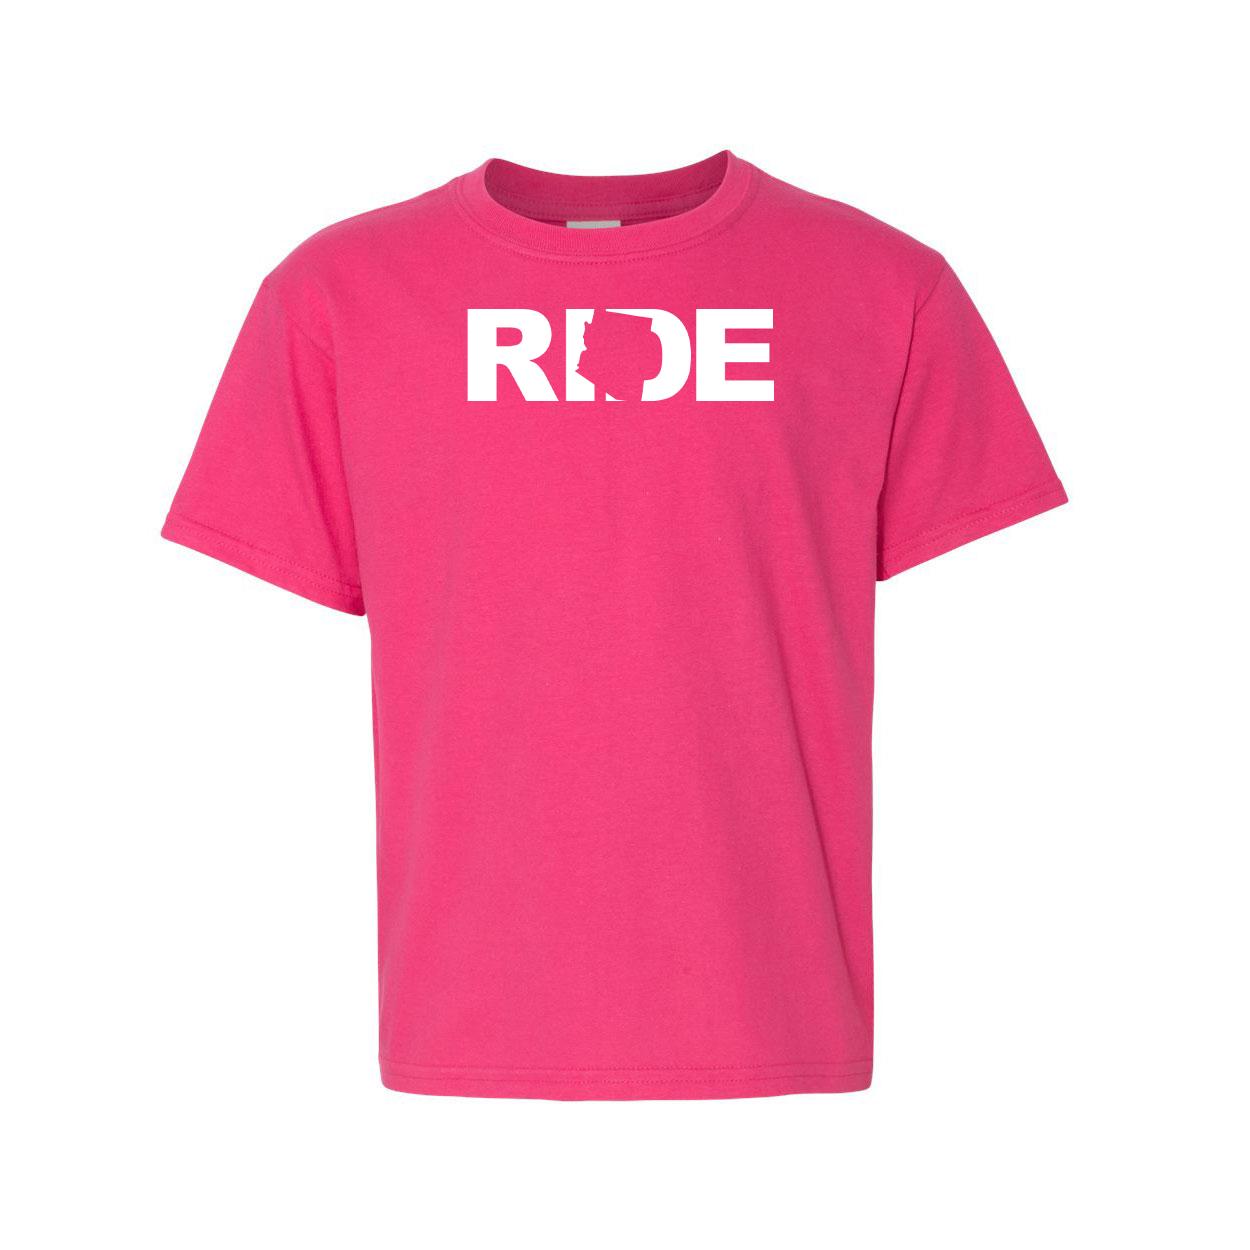 Ride Arizona Night Out Youth T-Shirt Pink (White Logo)